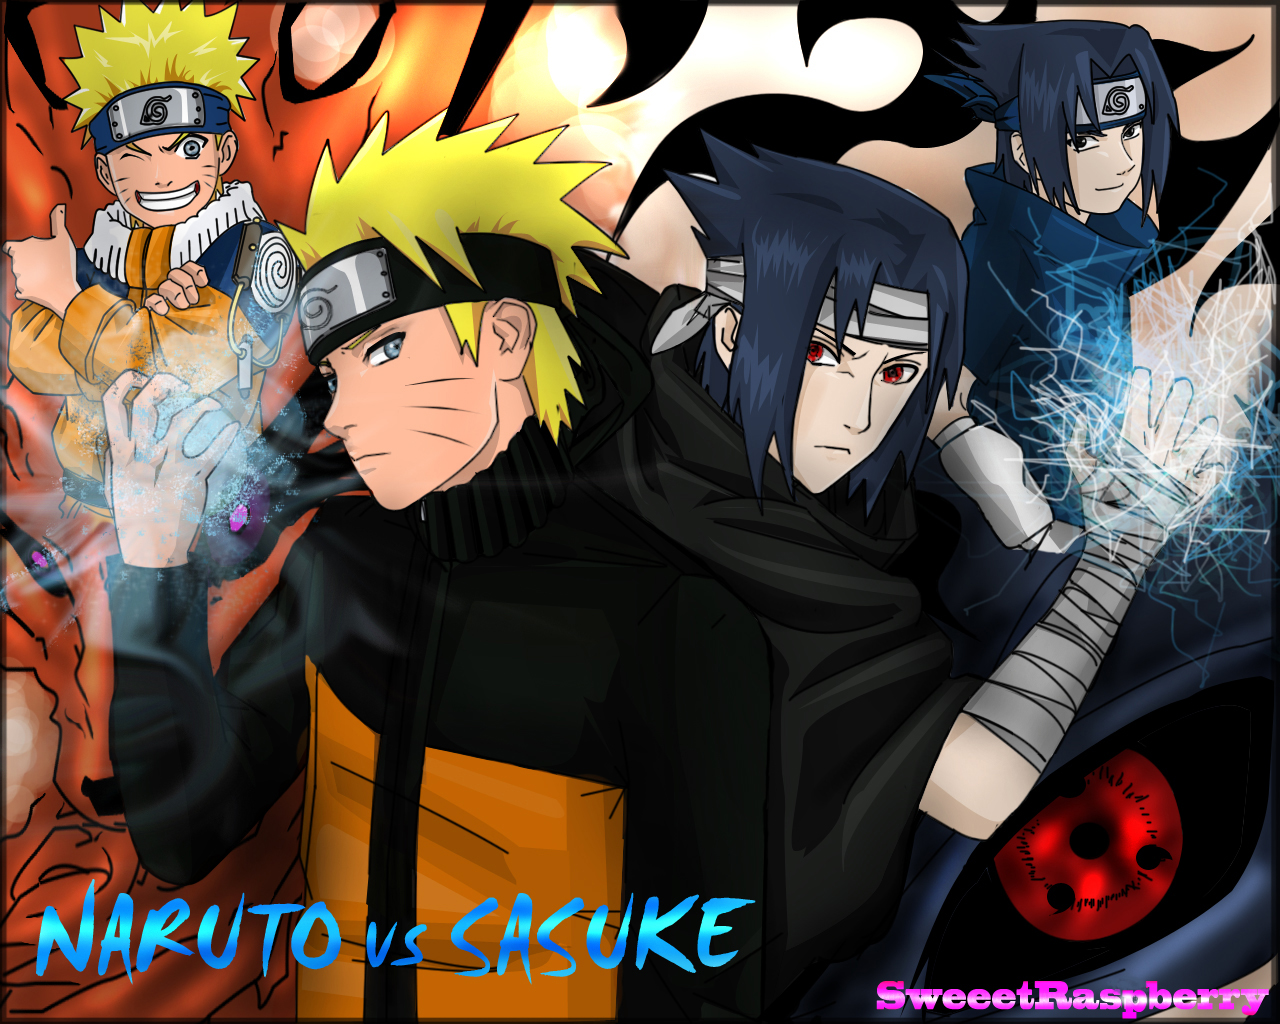 Sasuke and Naruto vs Dante and Vergil - Battles - Comic Vine